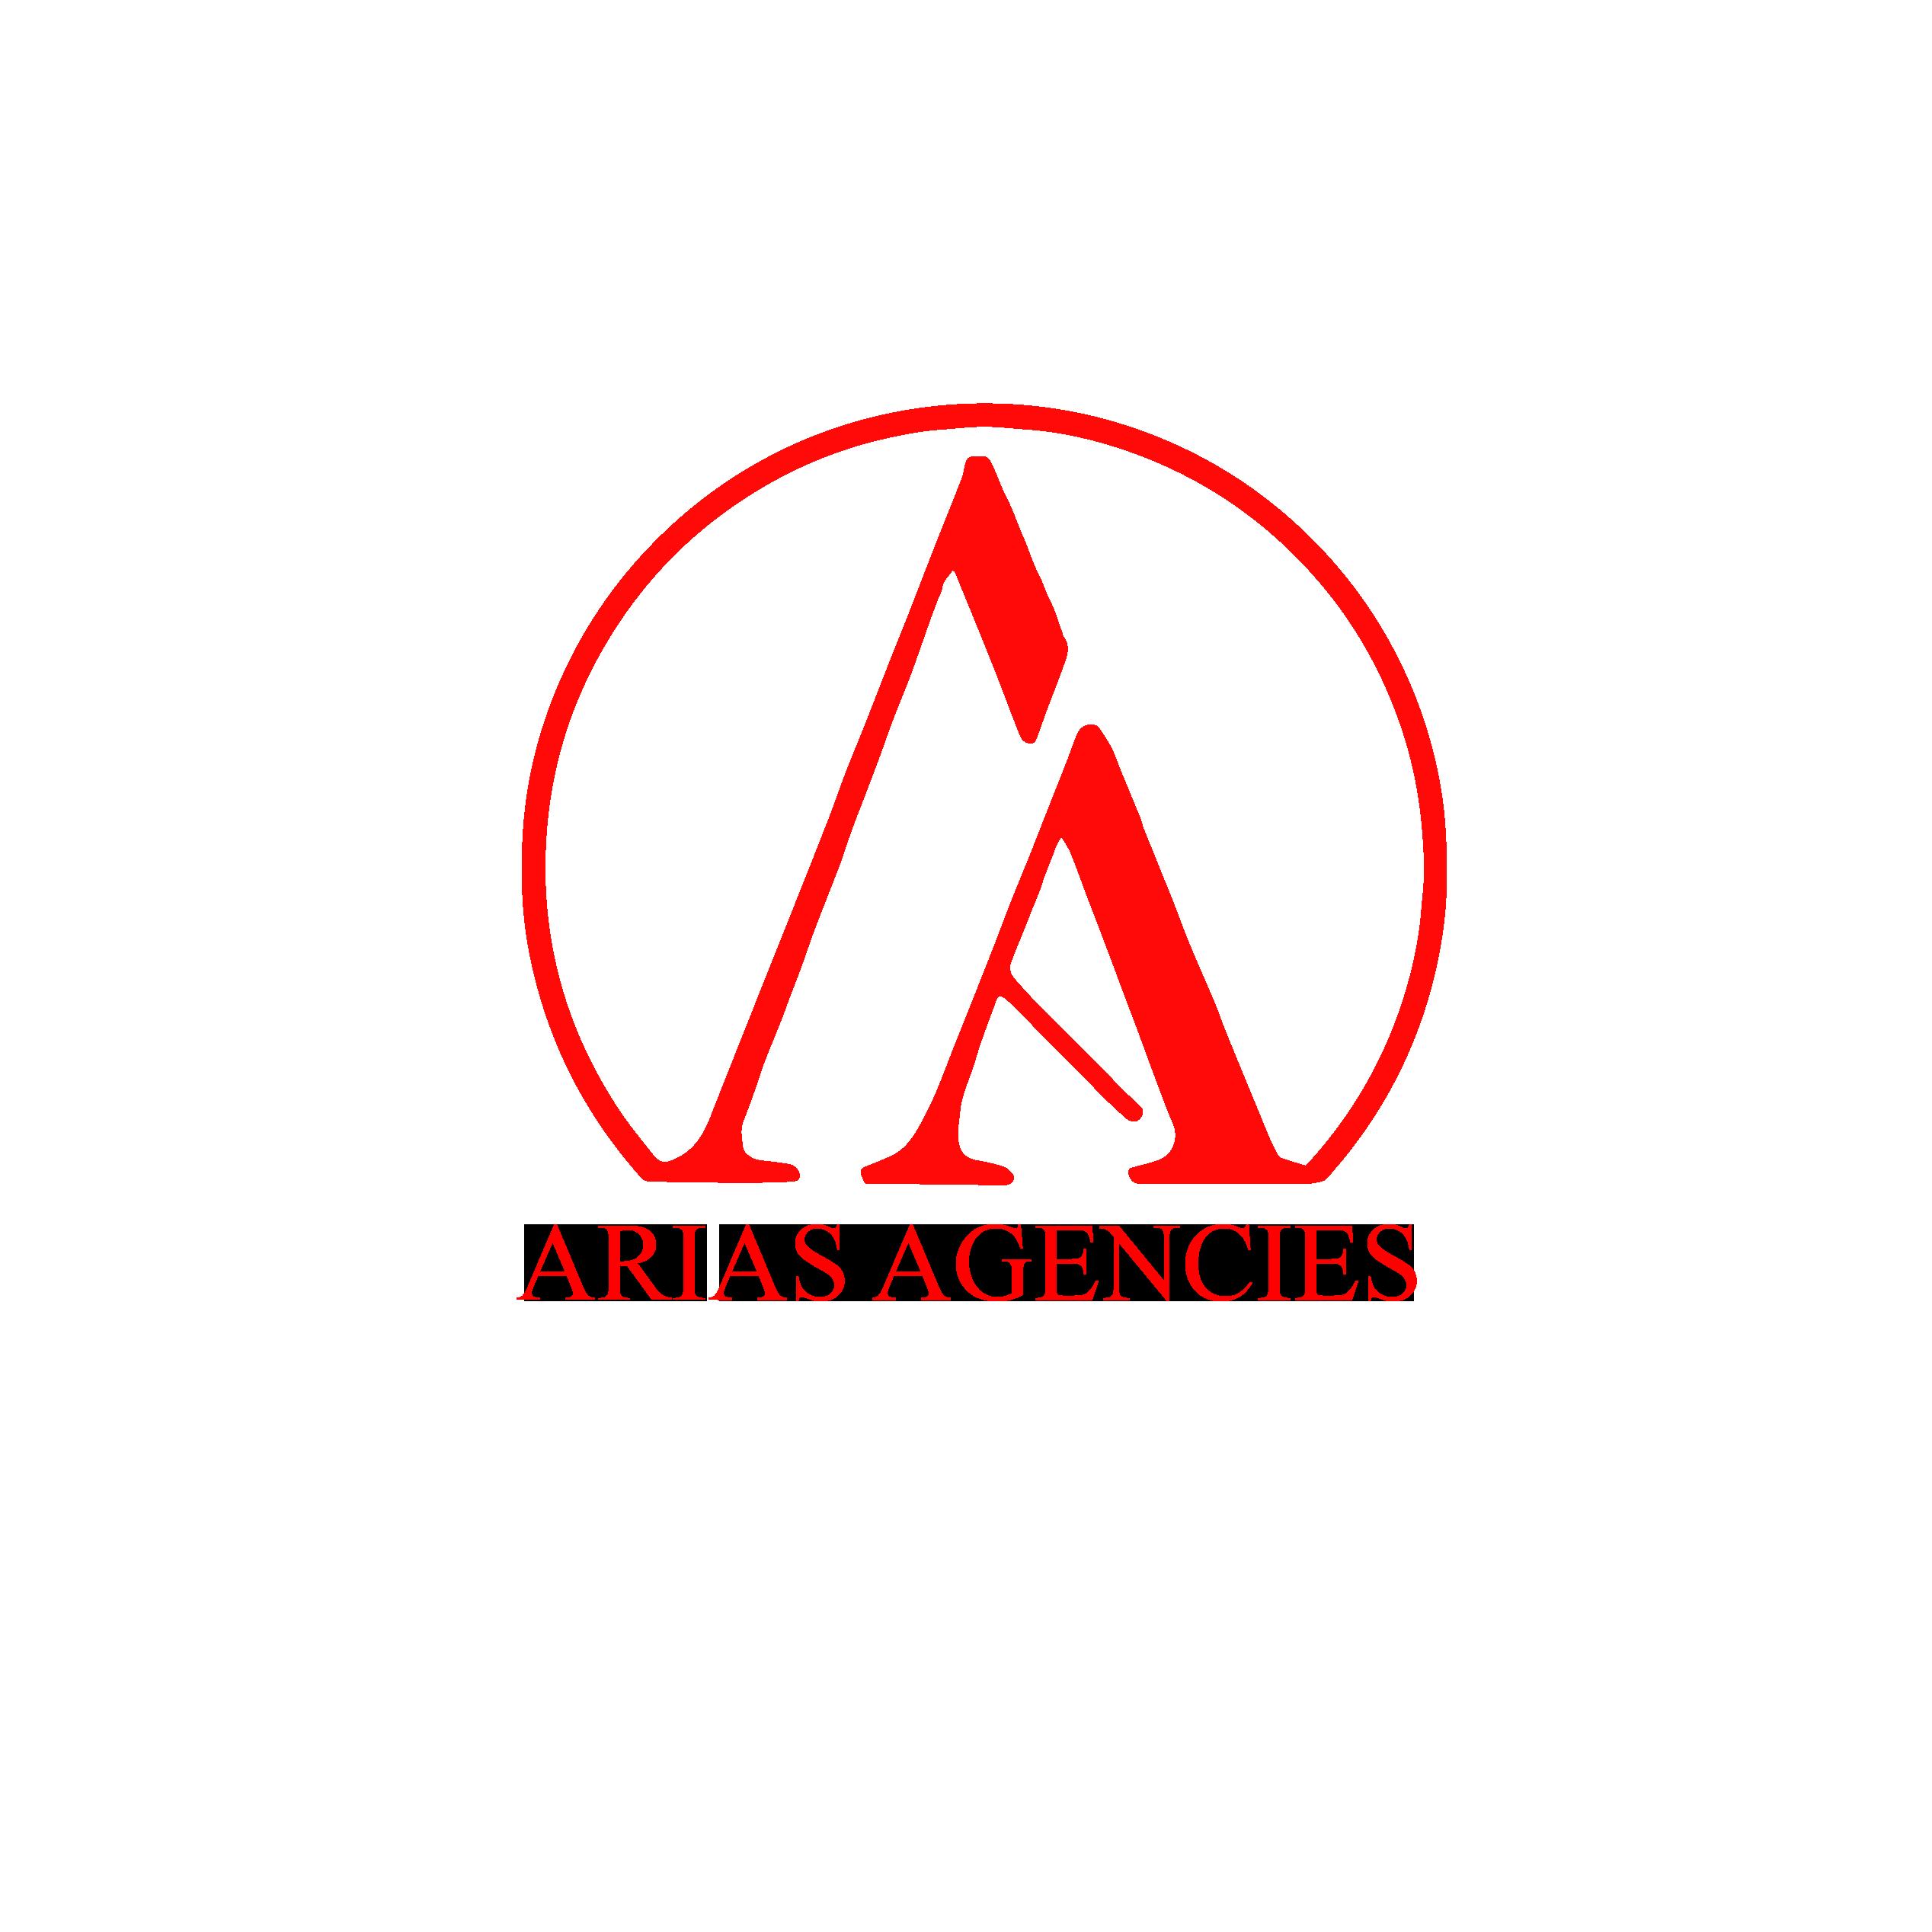 American Income Life Arias Agencies logo